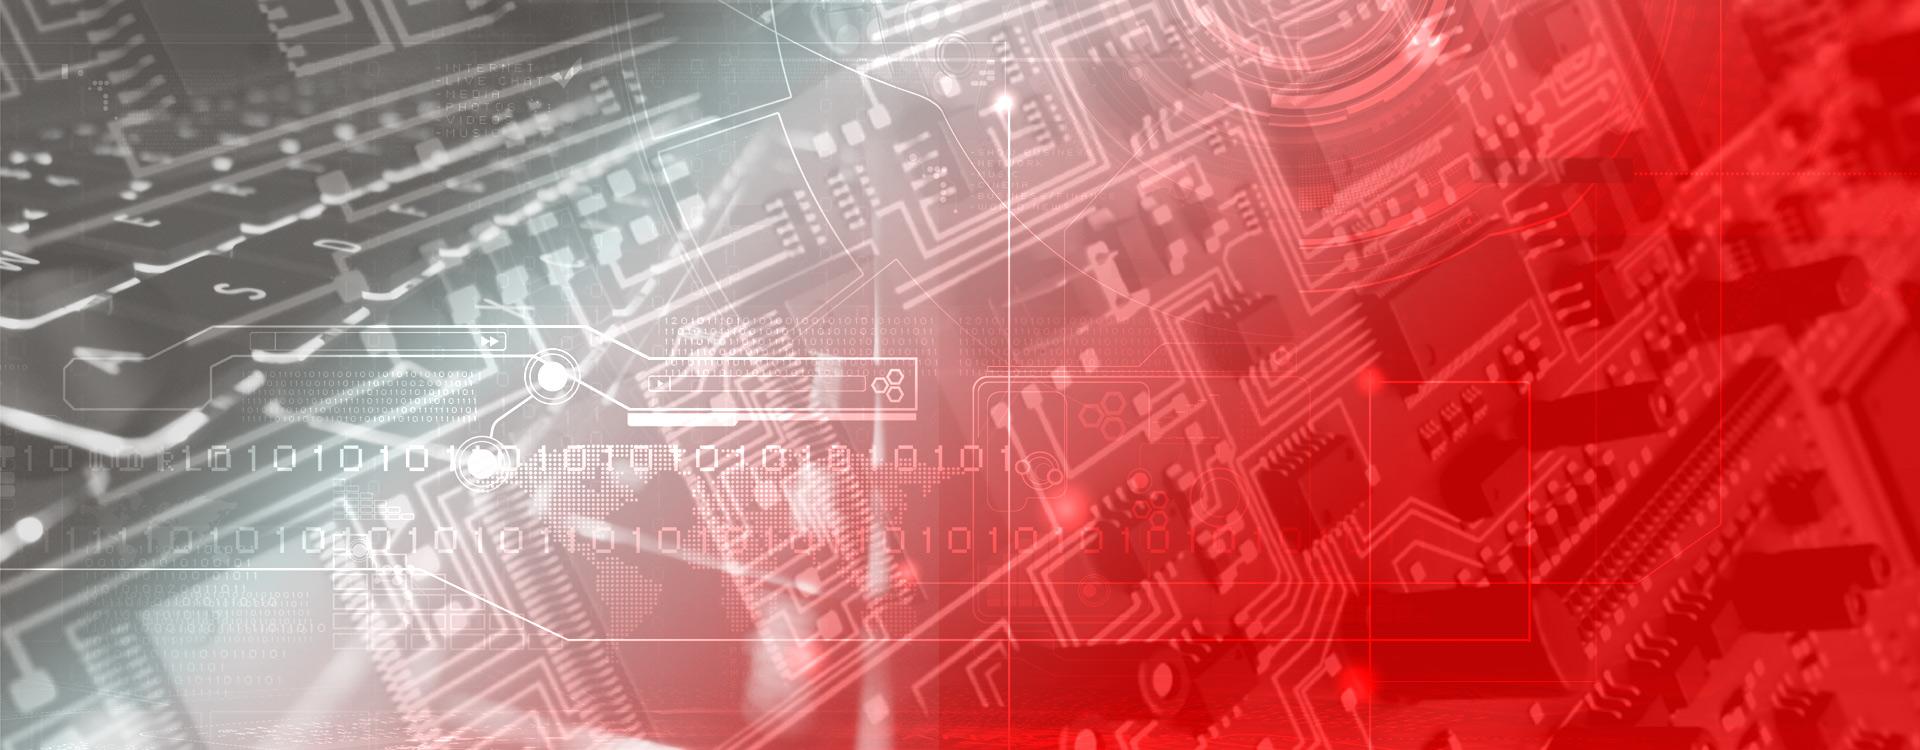 banner-principal-tech-3